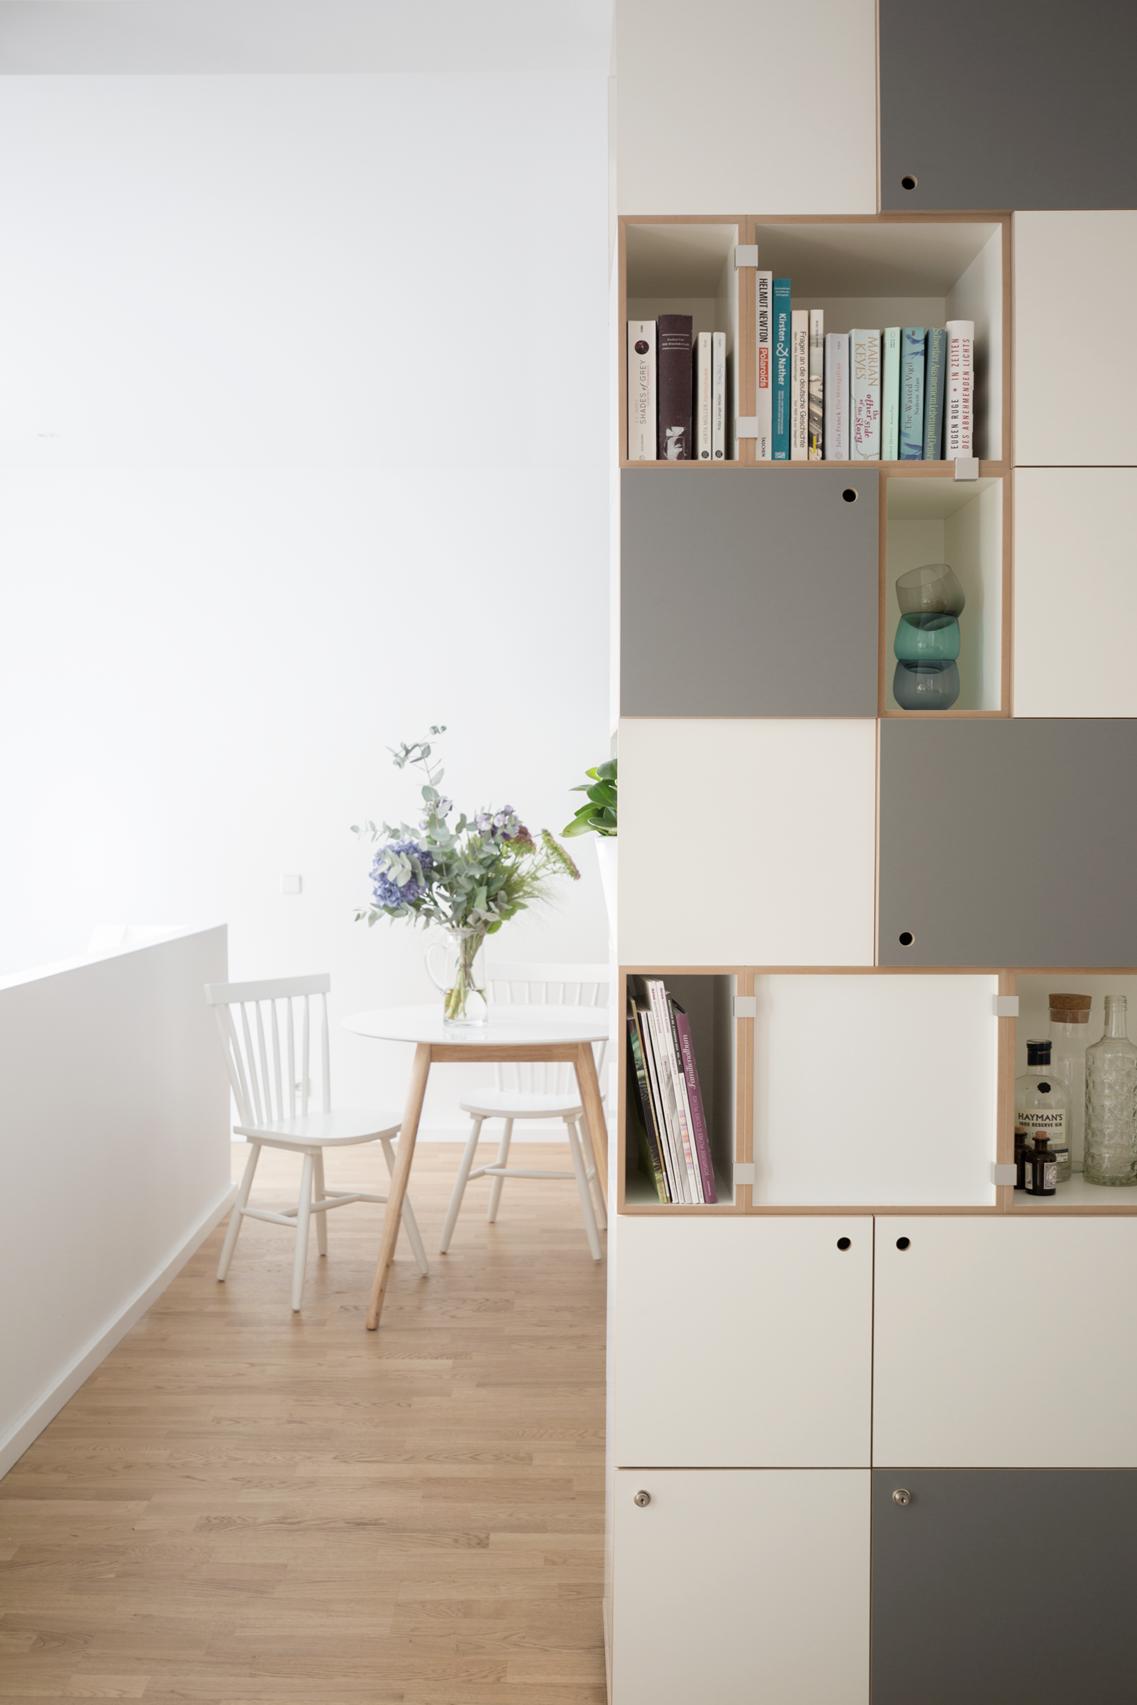 regalsystem bilder ideen couchstyle. Black Bedroom Furniture Sets. Home Design Ideas